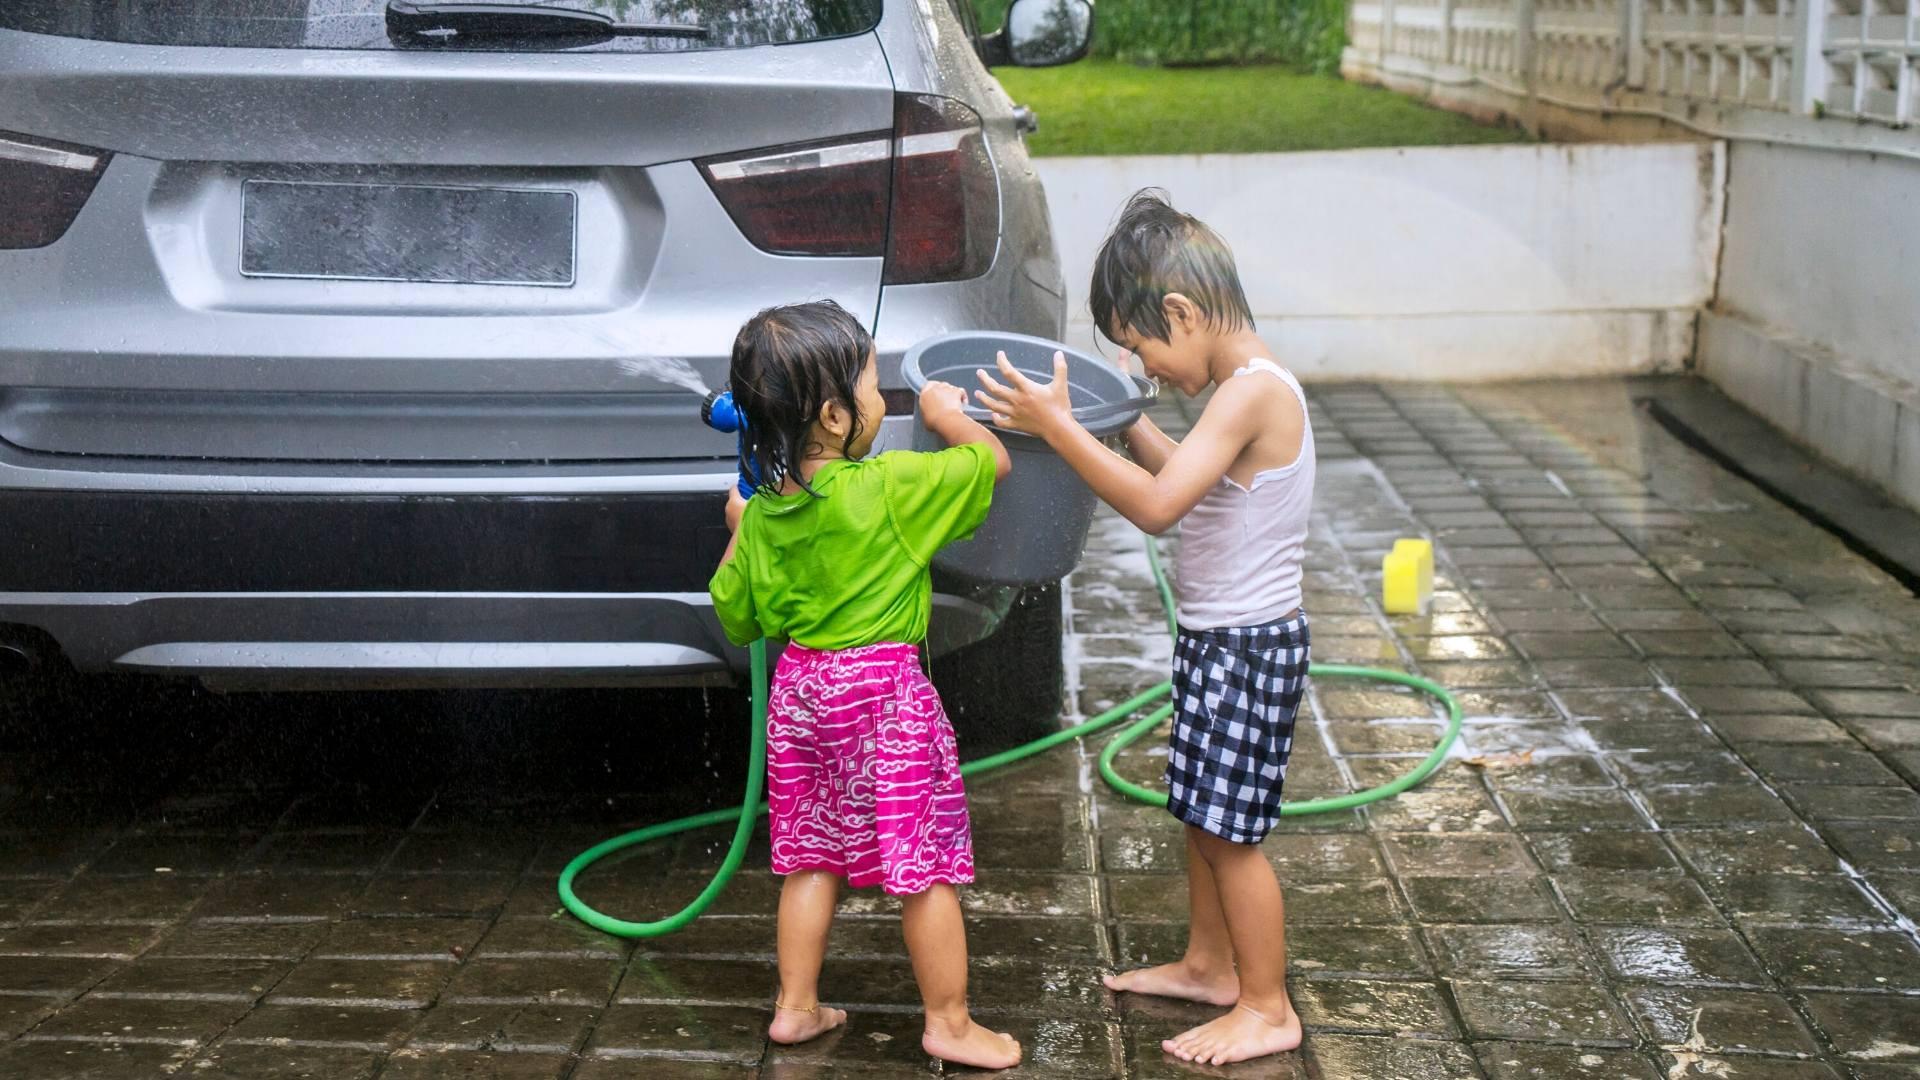 Image of Washing Your Car